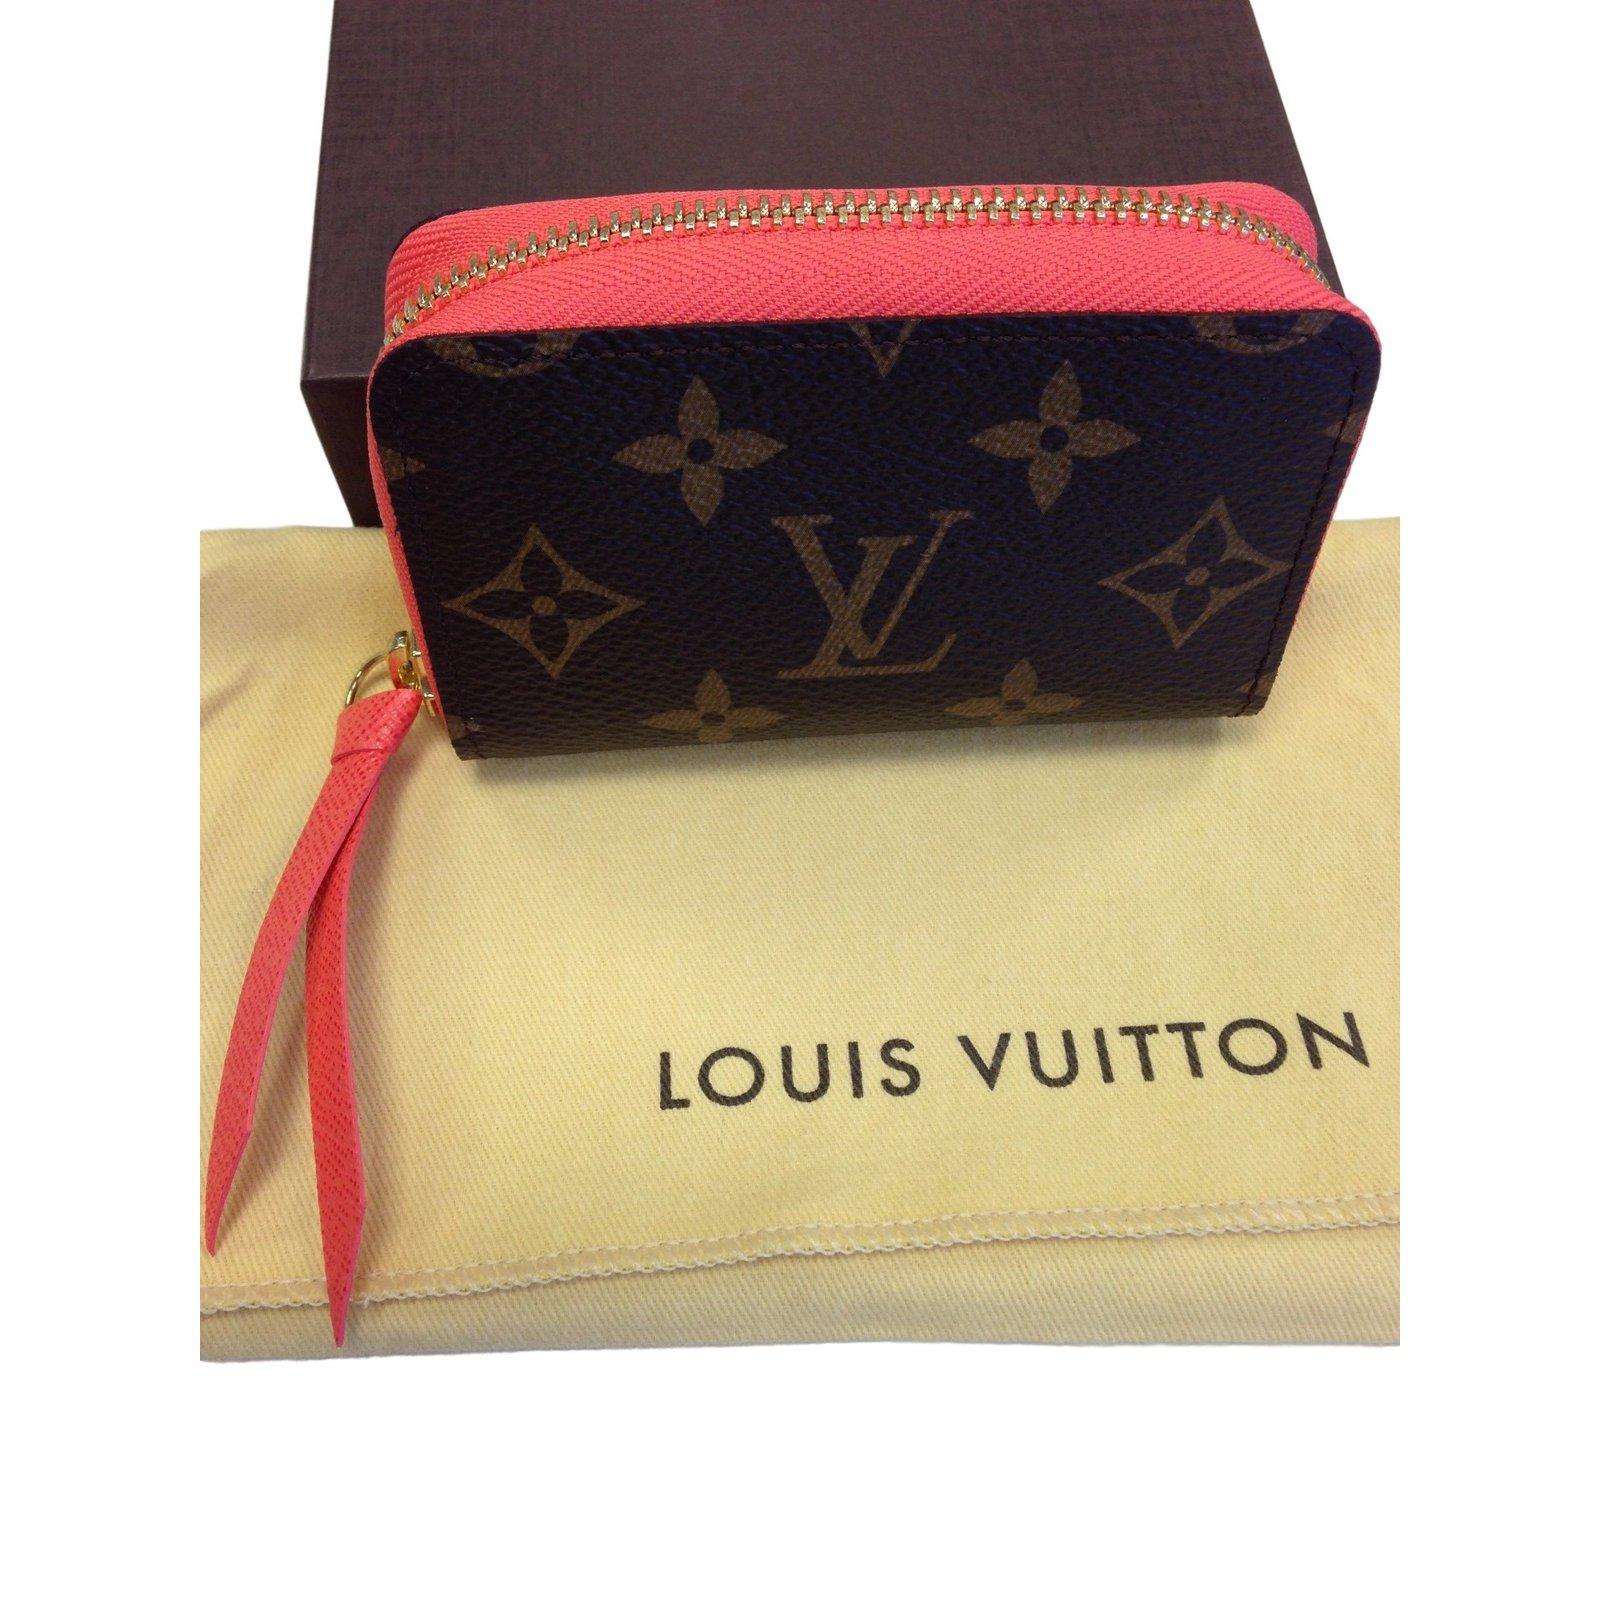 4d518104e567 Louis Vuitton ZIPPY MULTICARTES CARD HOLDER in POPPY Purses